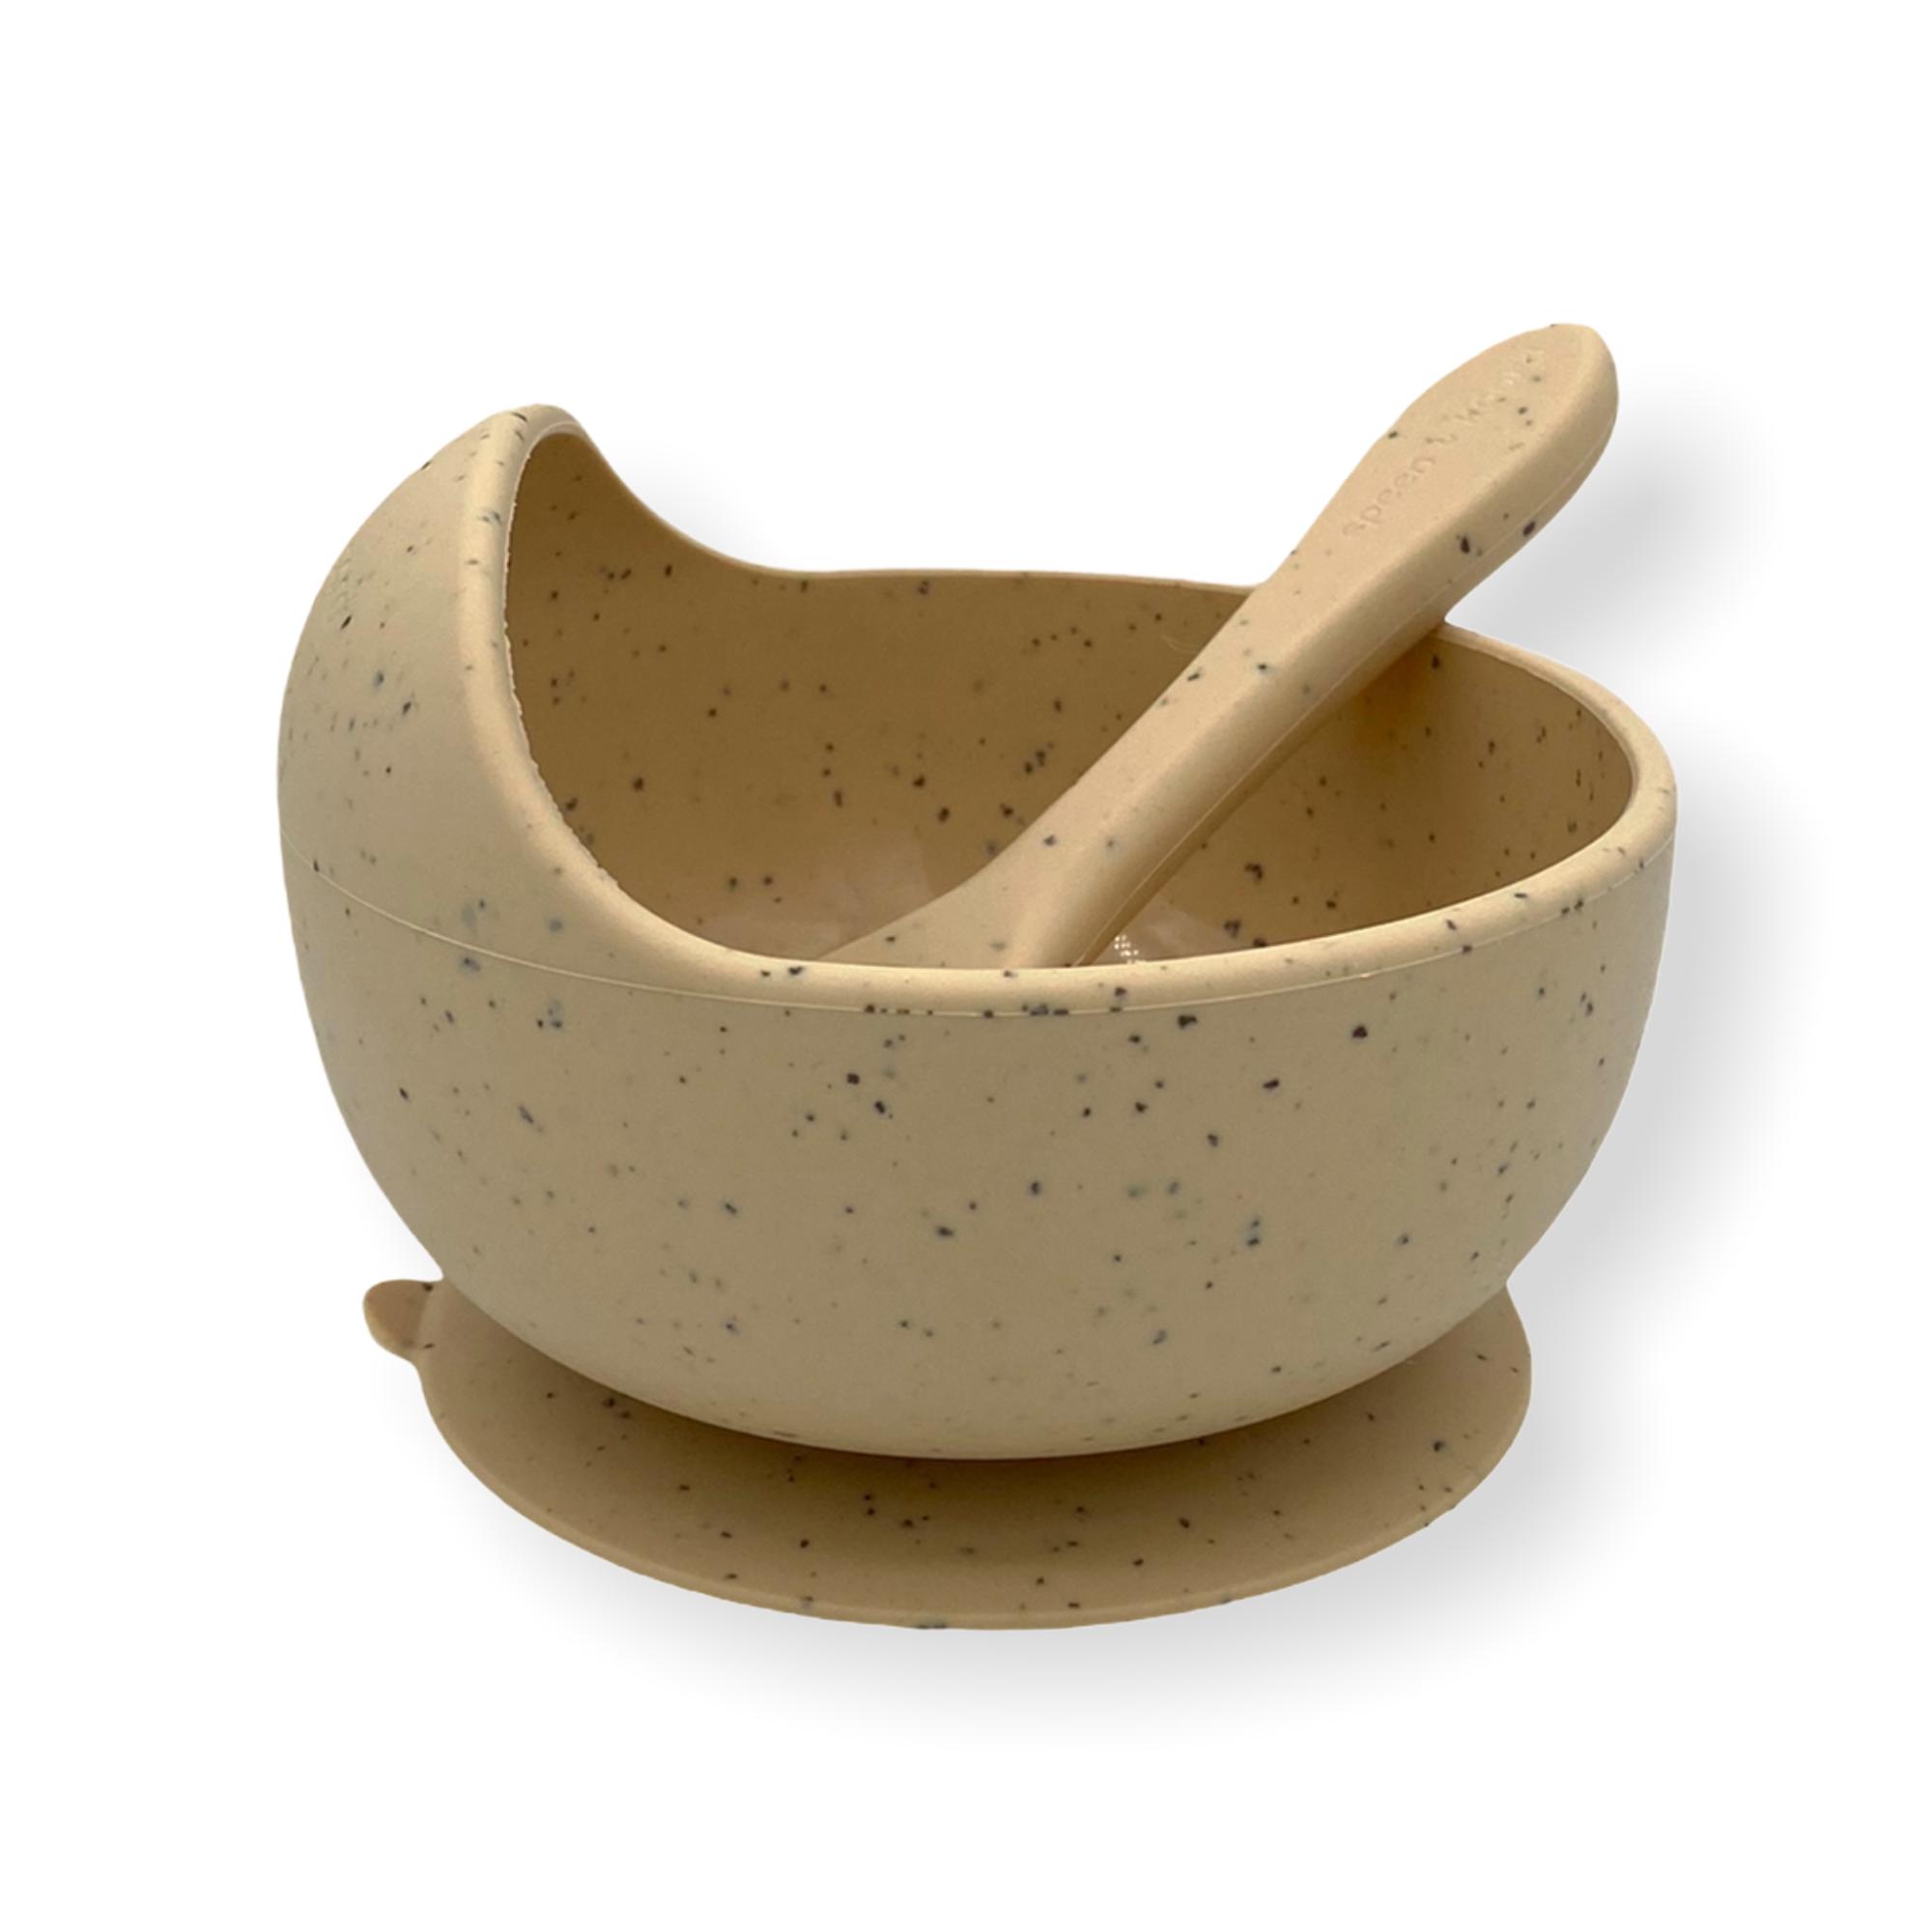 Afbeelding Speen & Koord Silicone kom + lepel I Speckled Sand